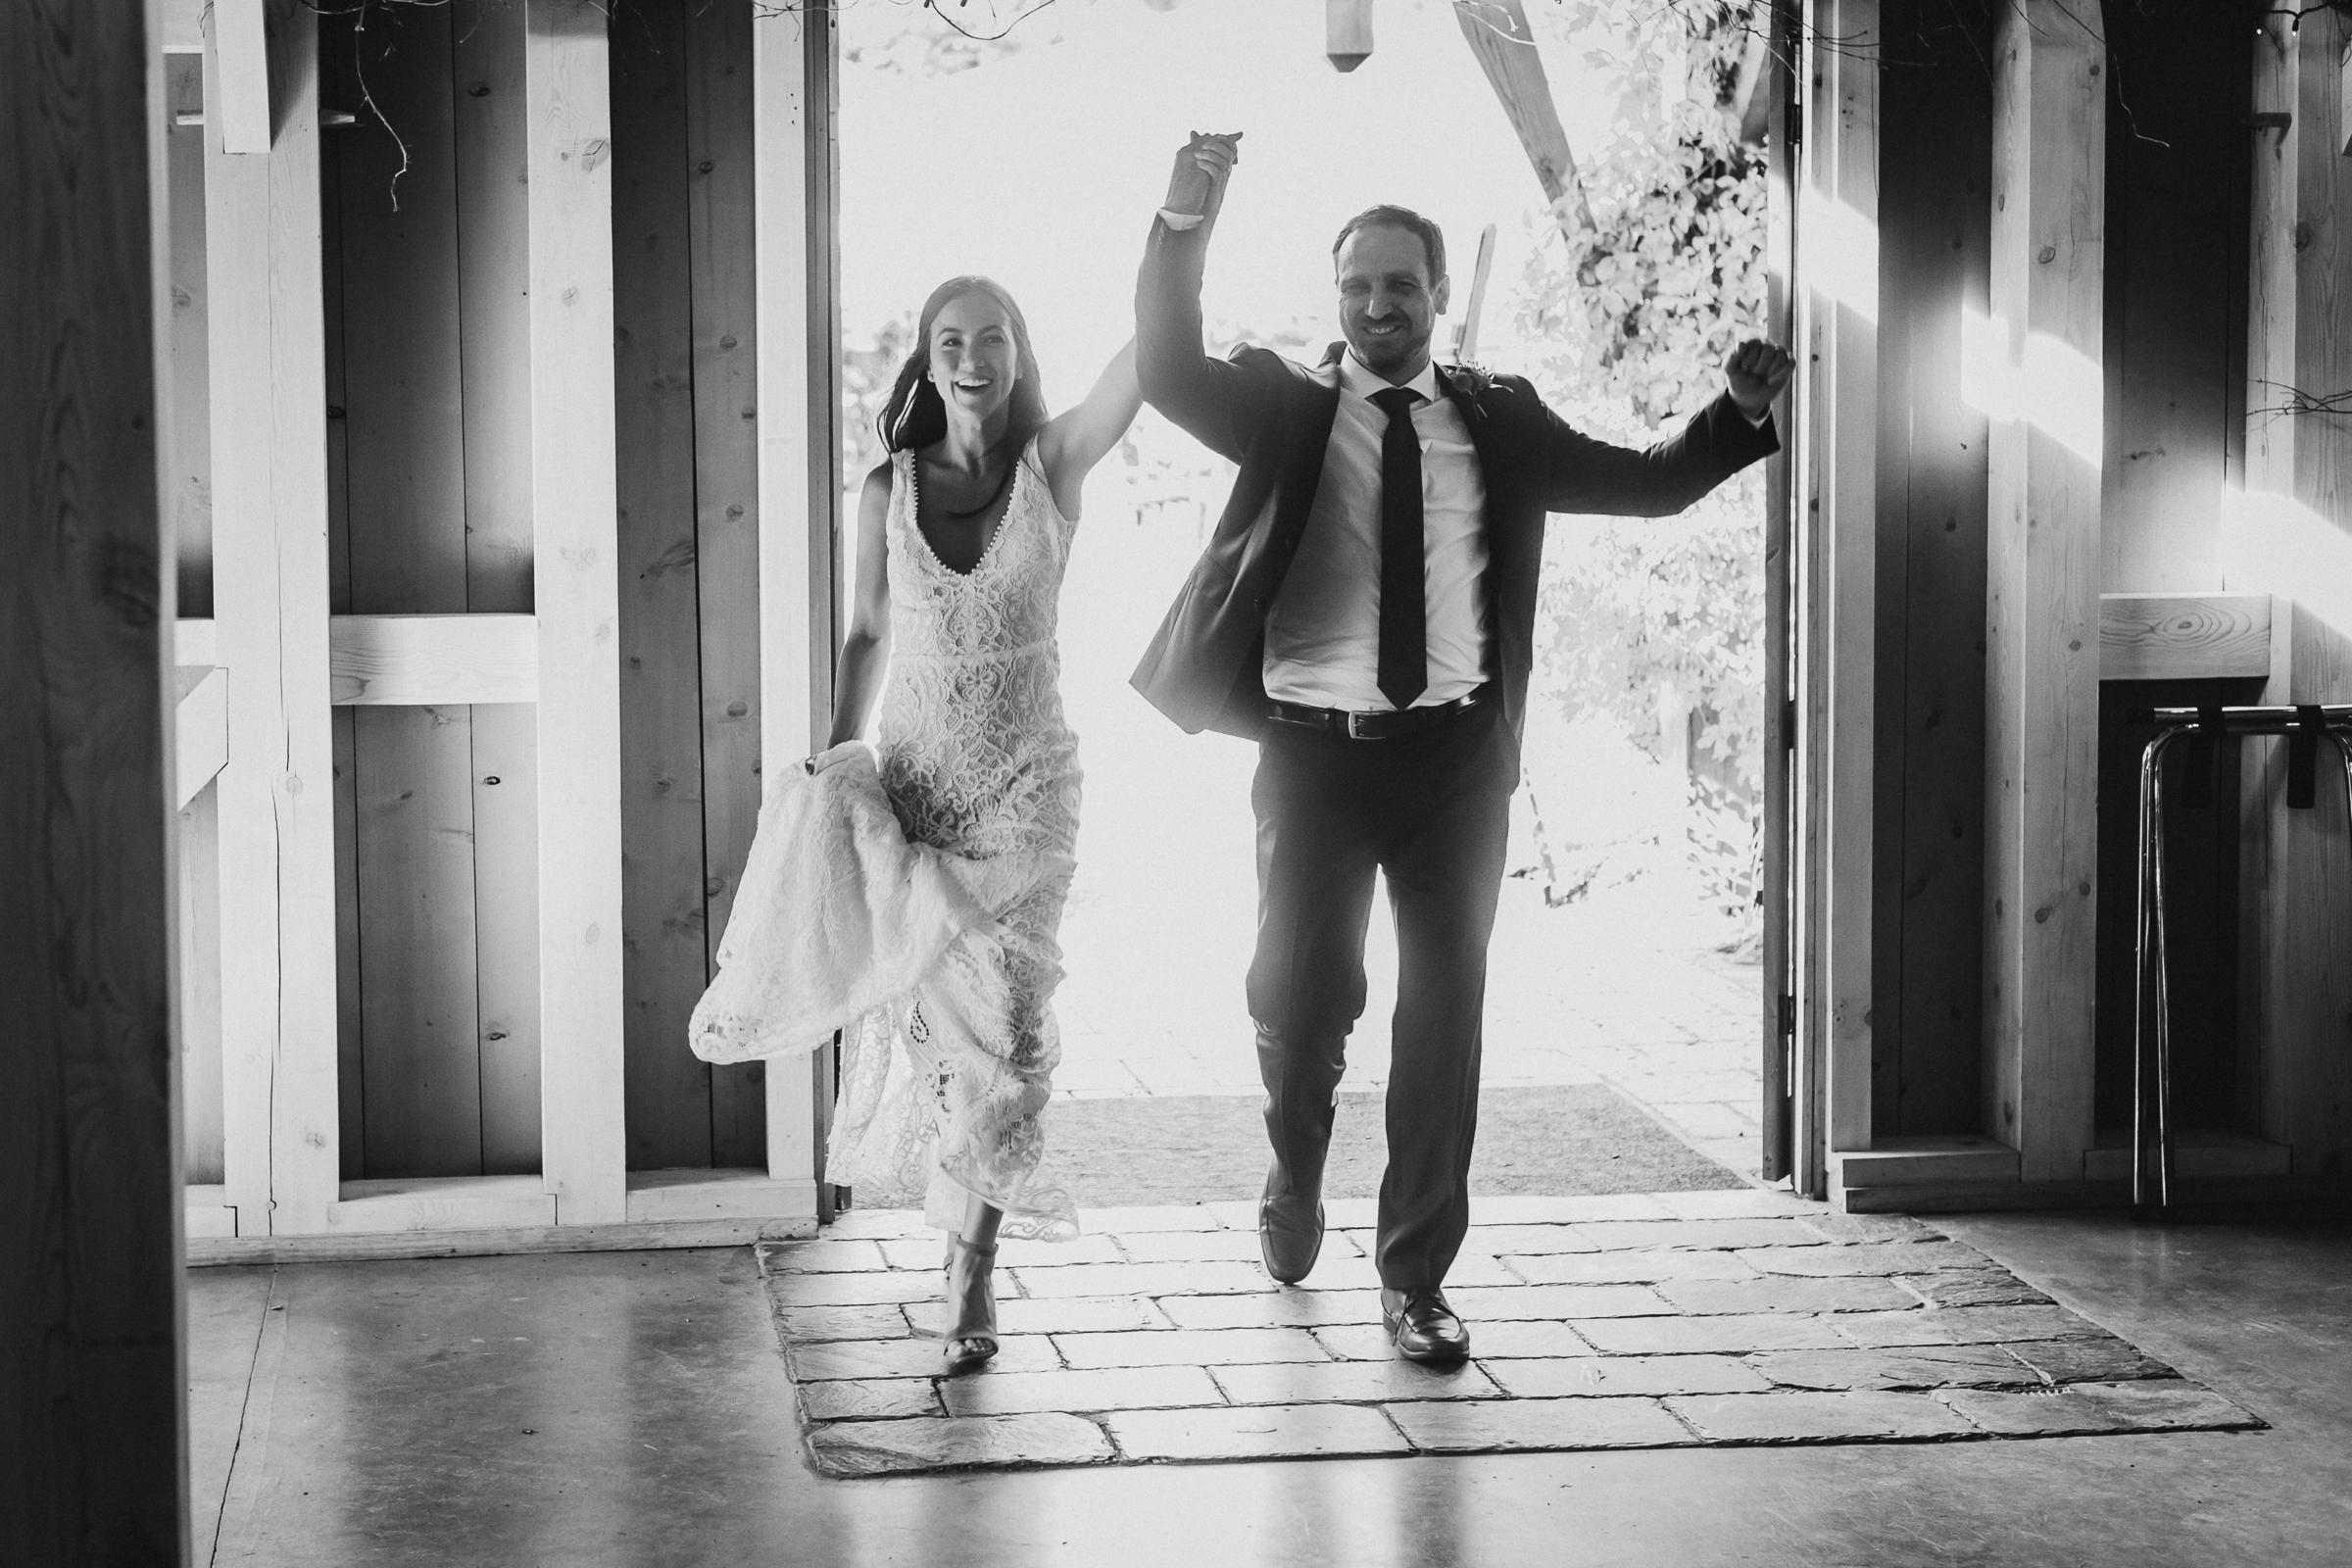 Marianmade-Farm-Wiscasset-Maine-Fine-Art-Documentary-Wedding-Photographer-Elvira-Kalviste-Photography-107.jpg